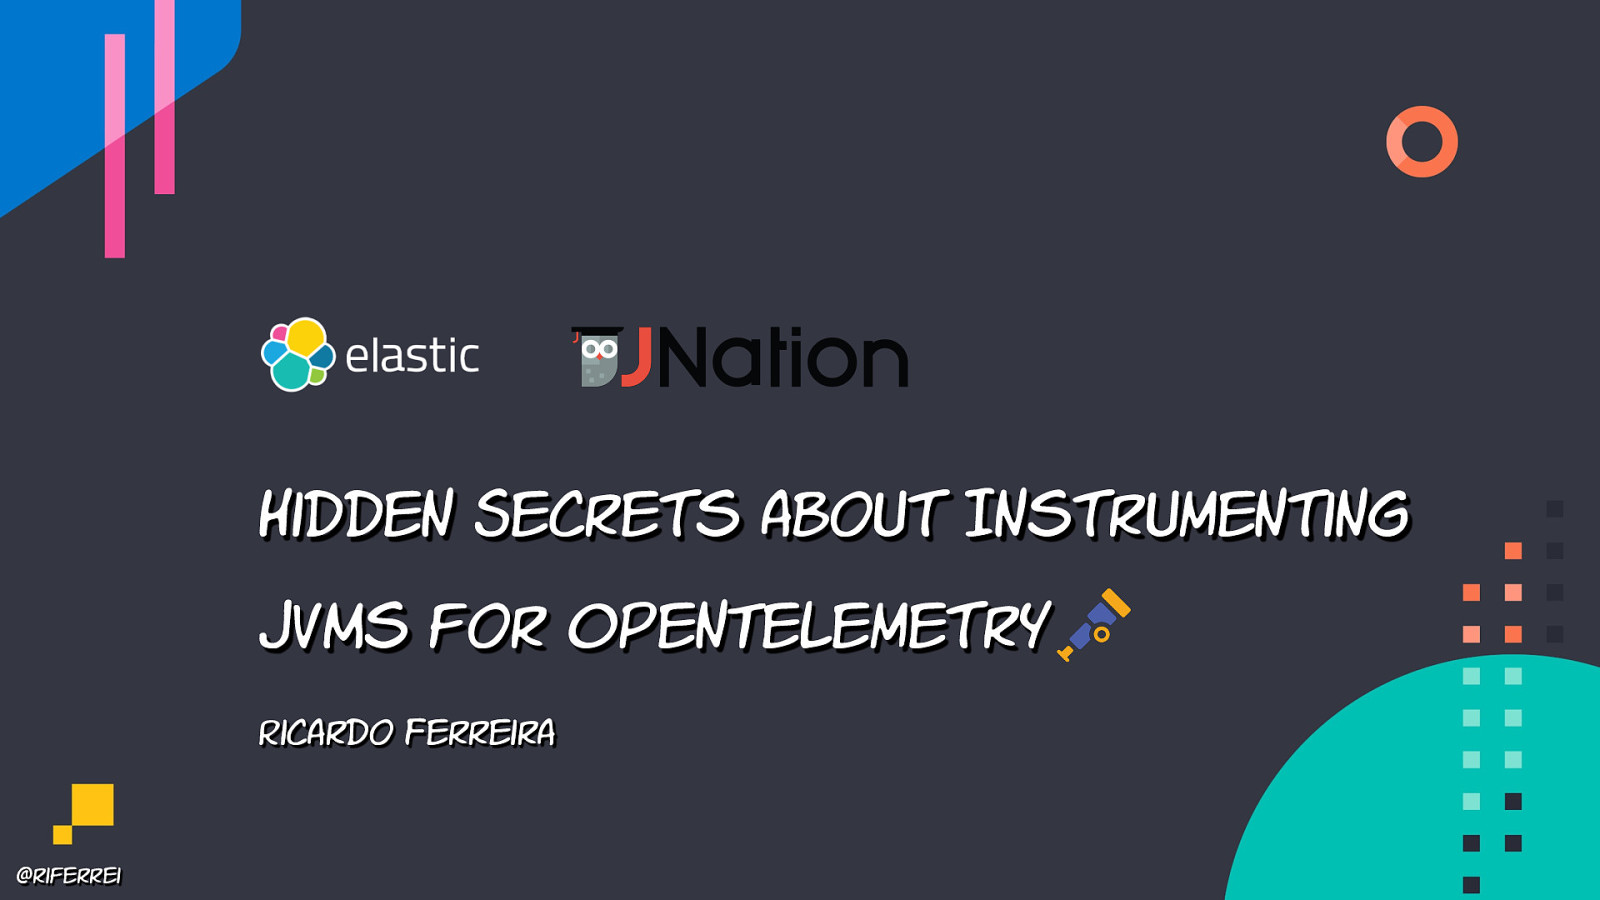 Hidden Secrets about Instrumenting JVMs for OpenTelemetry by Ricardo Ferreira